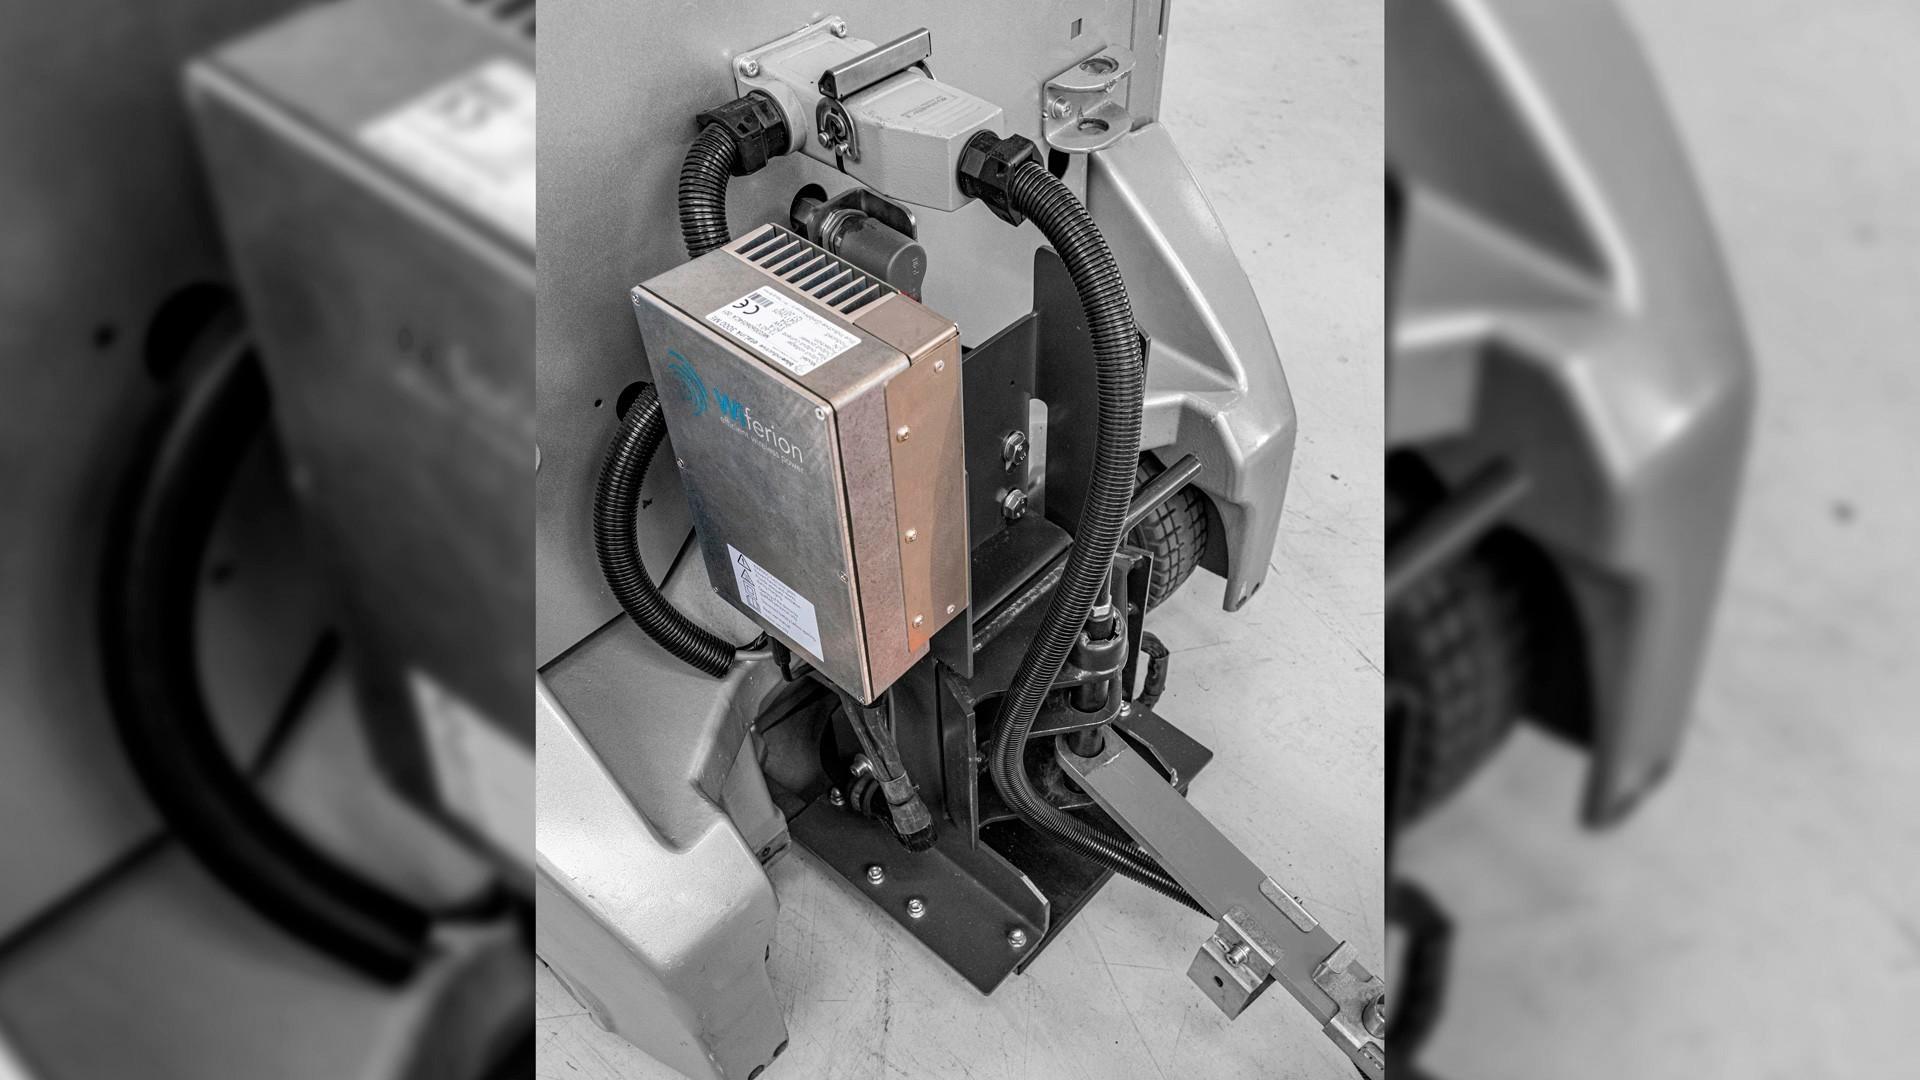 induktives laden nachruesten - retrofit wireless charging tugger train still